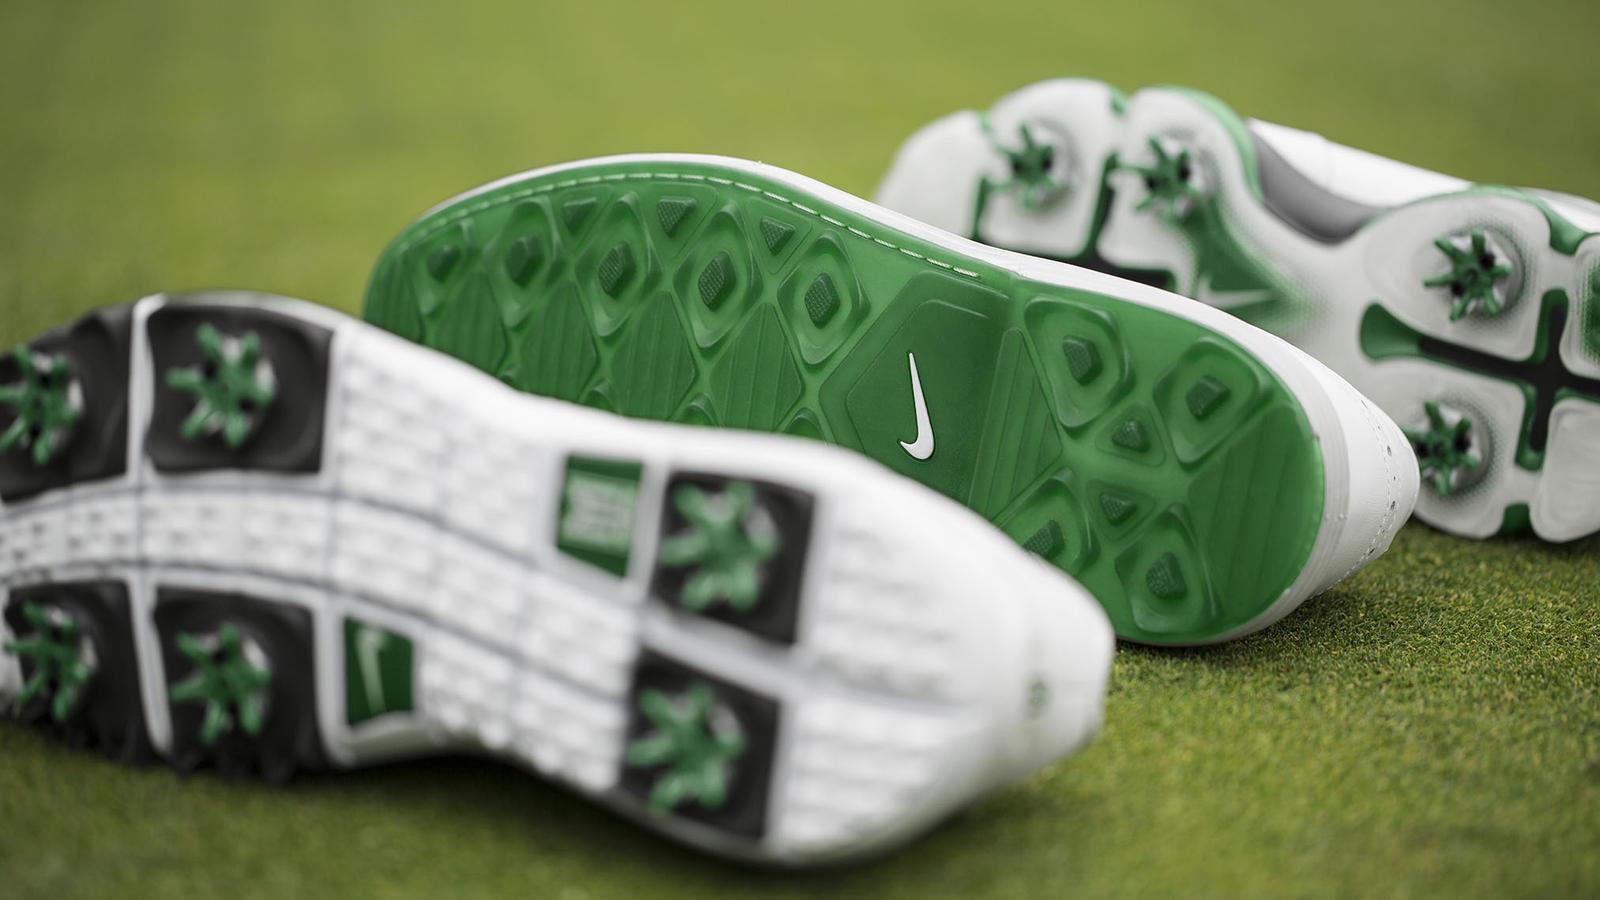 Nike LE Footwear